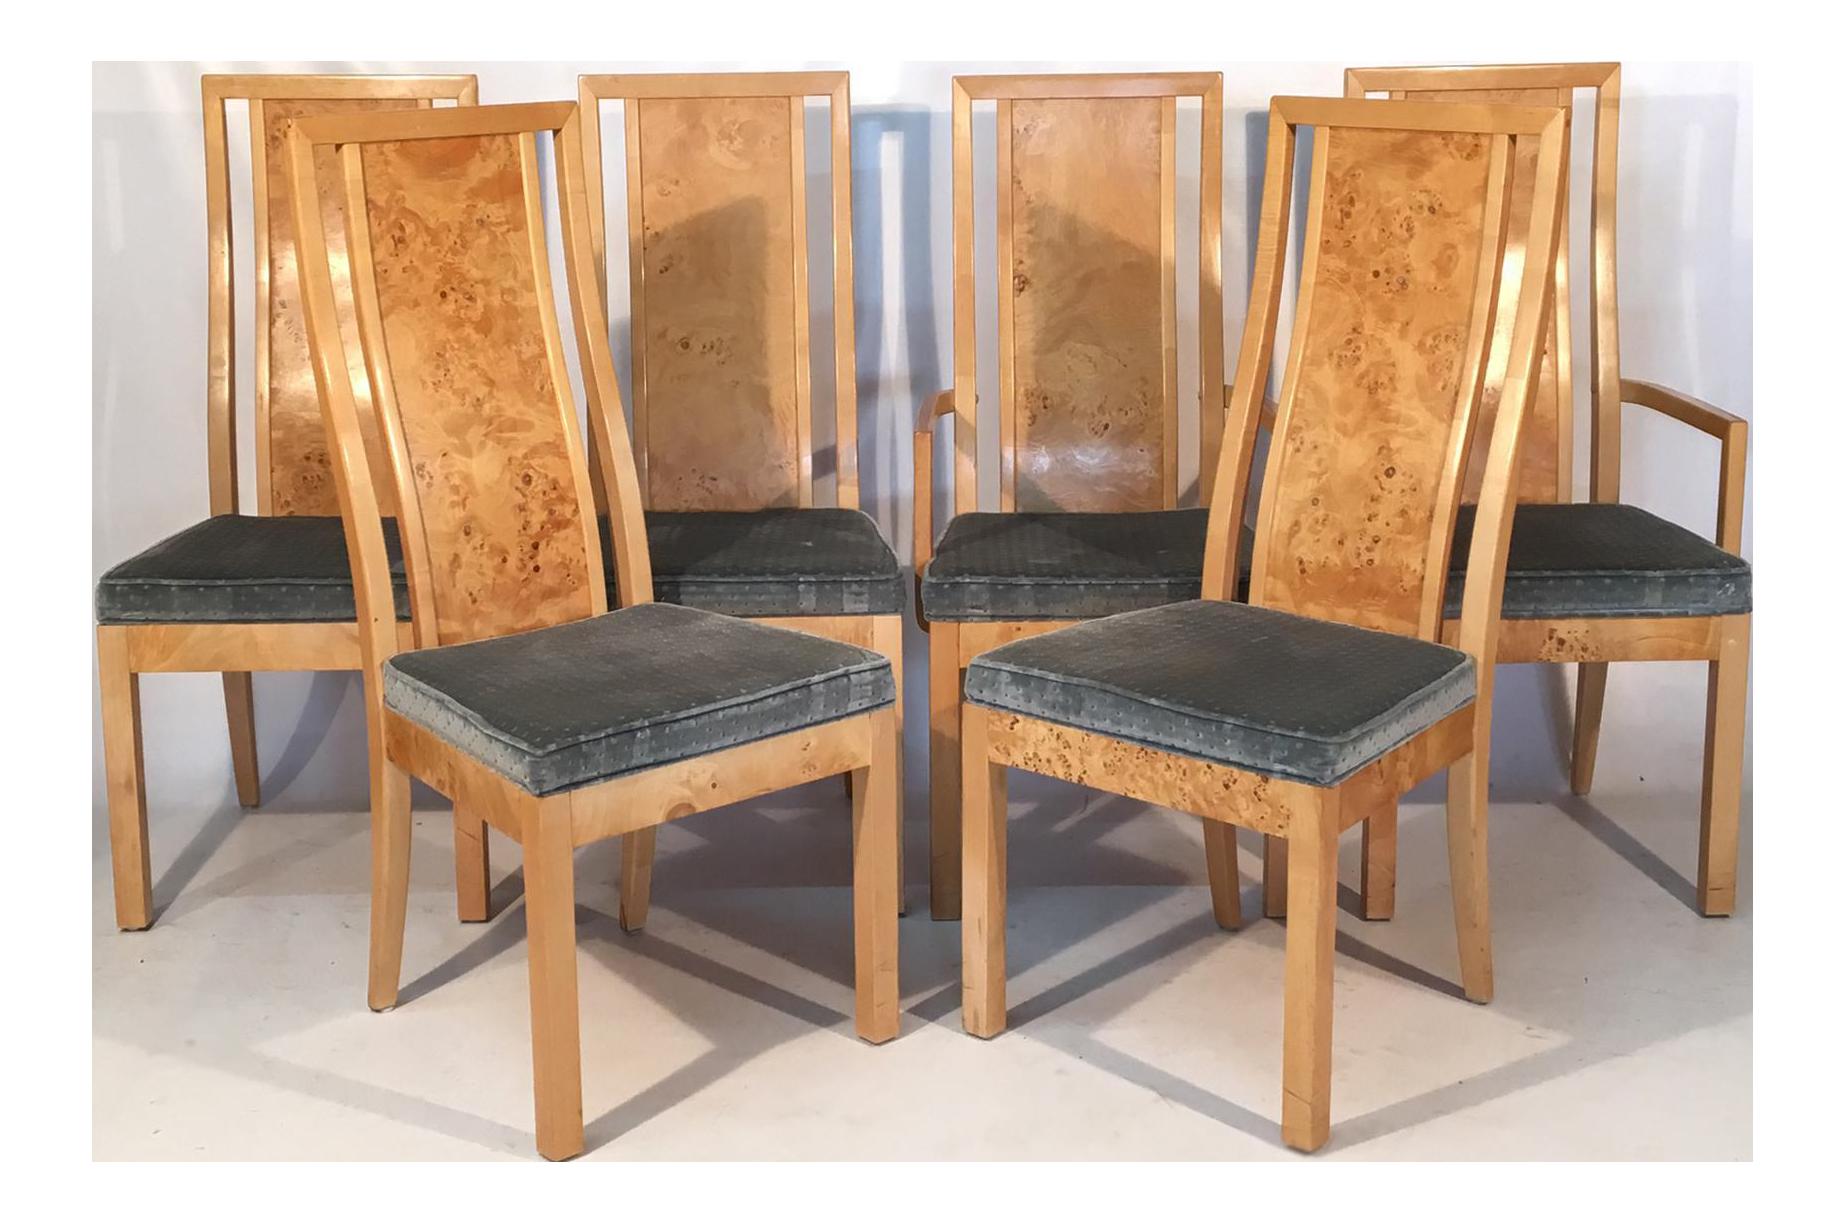 set of 6 light burlwood chairs with velvet upholstered seats rh pinterest com Burlwood Cigar Chair Burlwood Tables Chairs